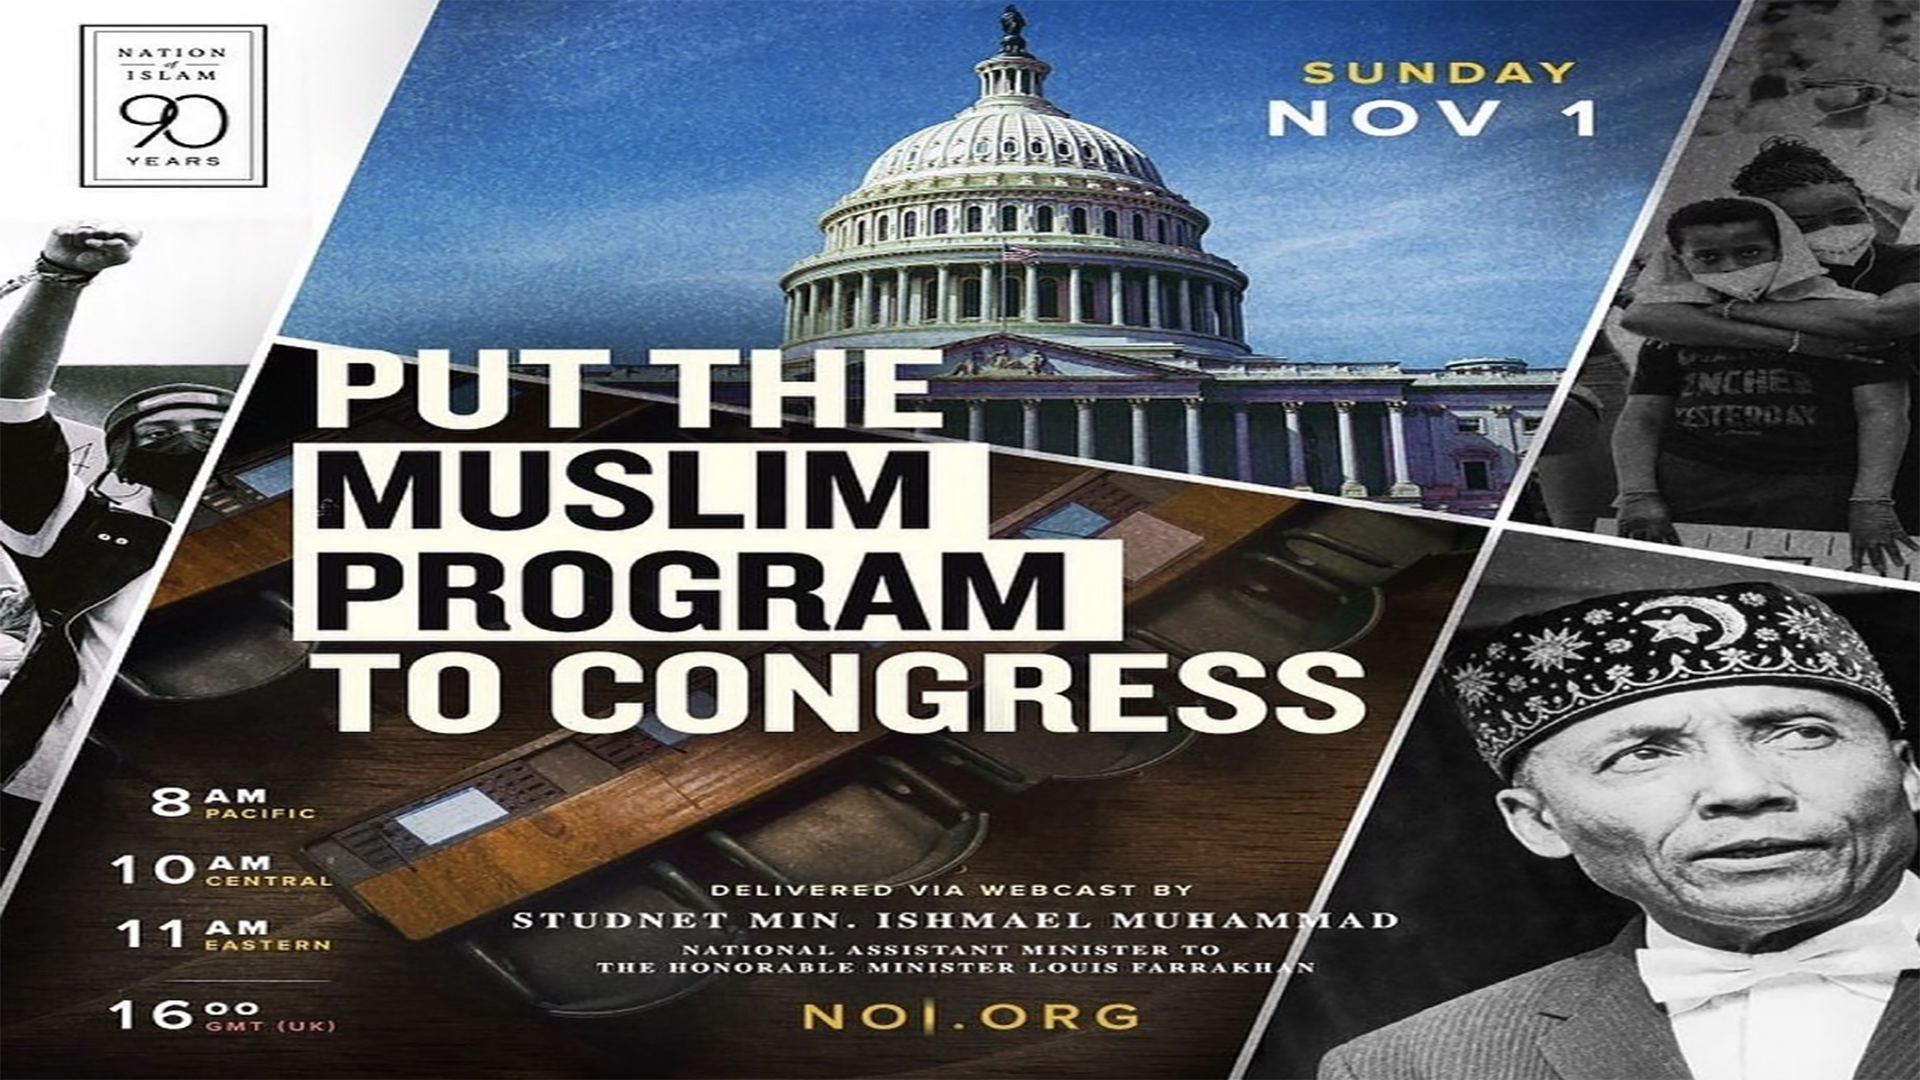 Put The Muslim Program To Congress